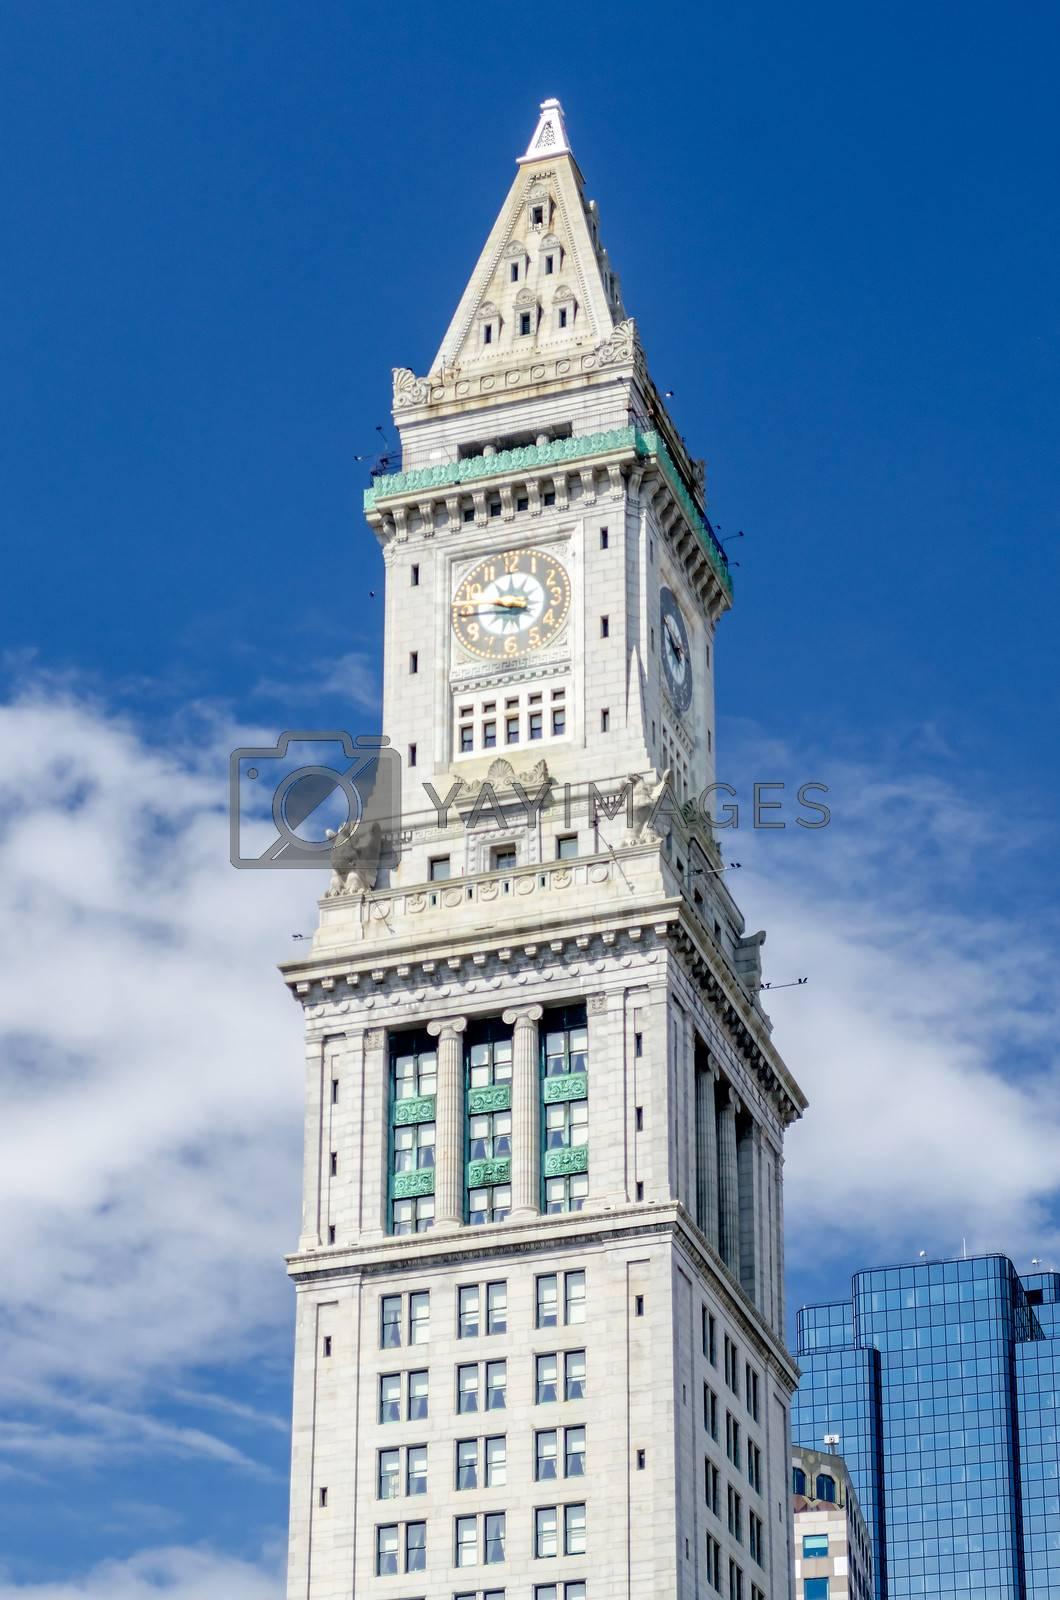 Custom House Tower, Boston by Marco Rubino